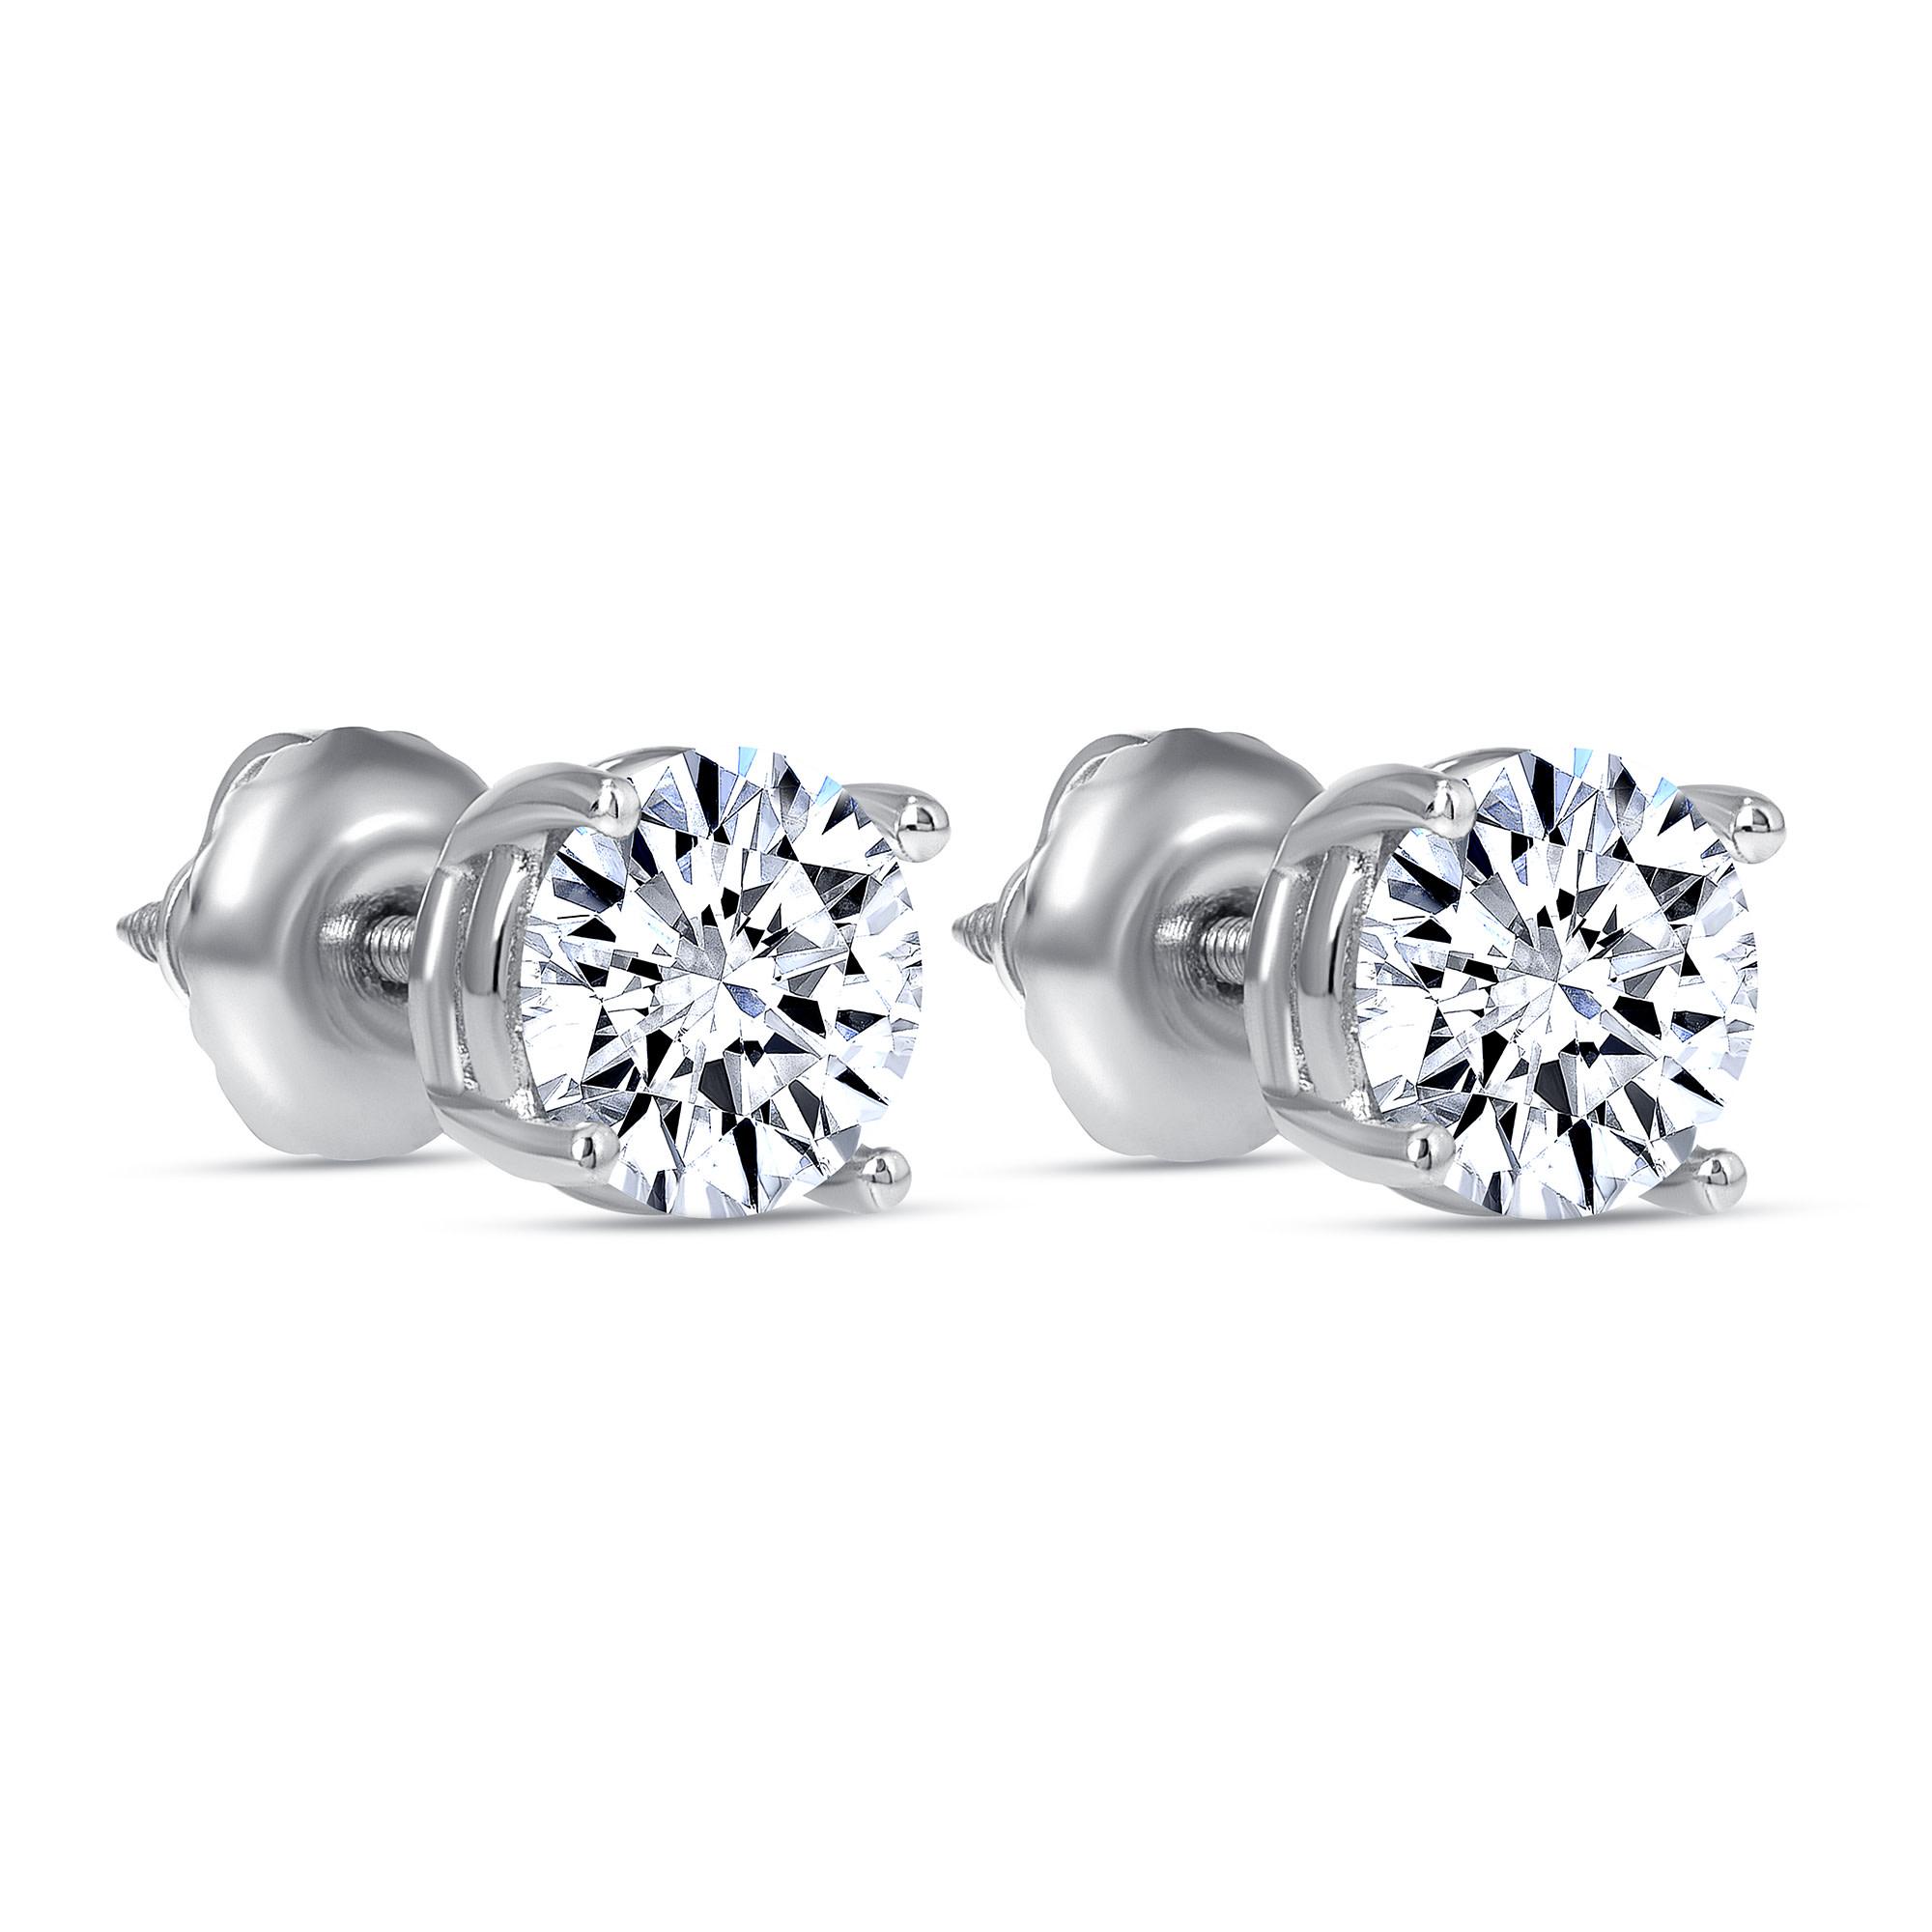 2 carat diamond stud earring white gold